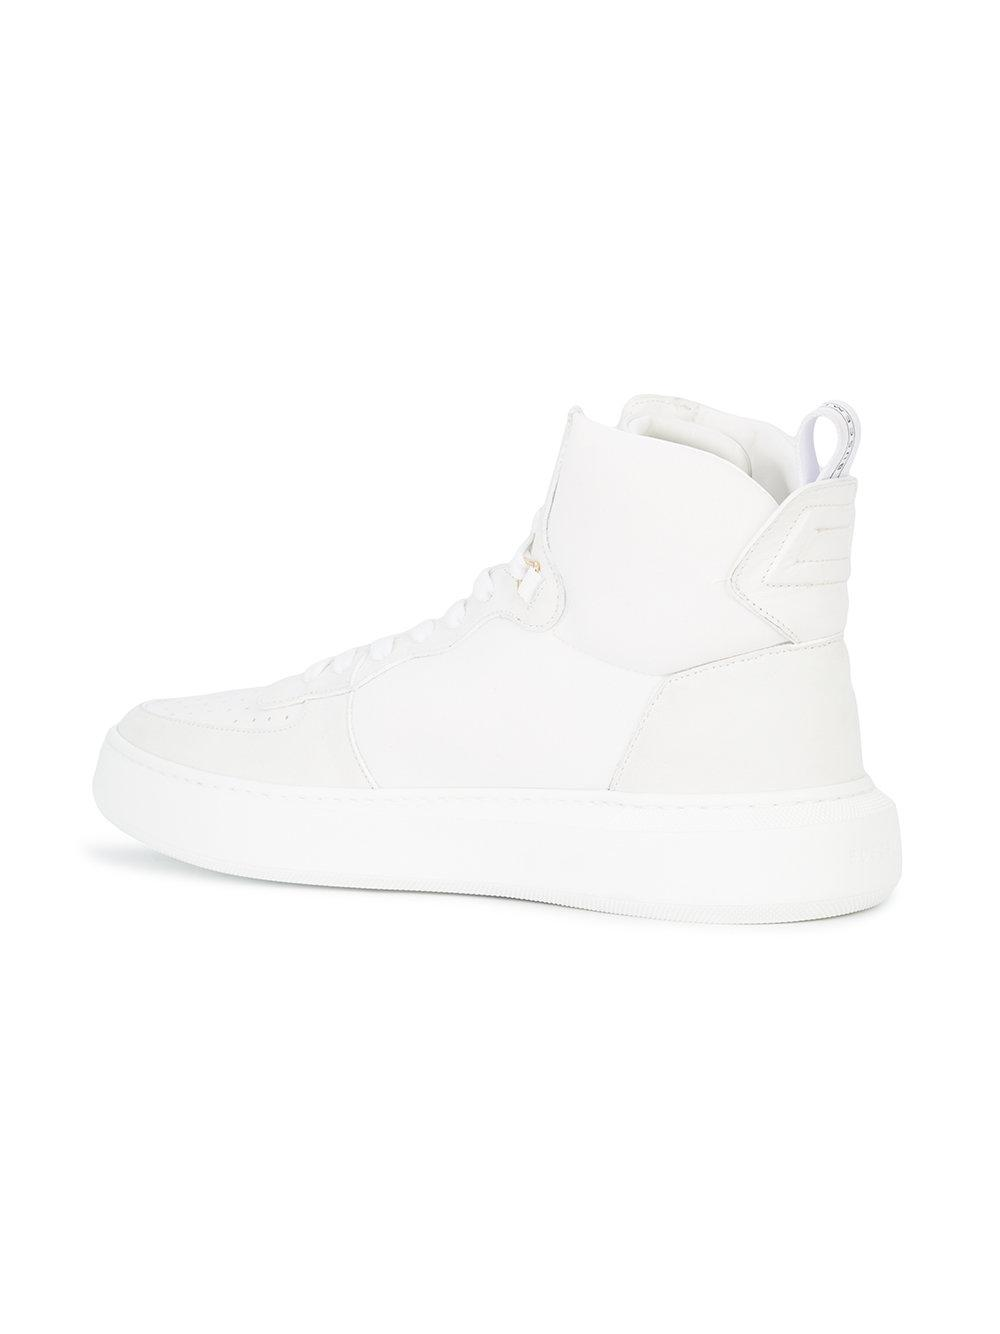 BUSCEMIUno Basket sneakers 3U1FwL6jo0